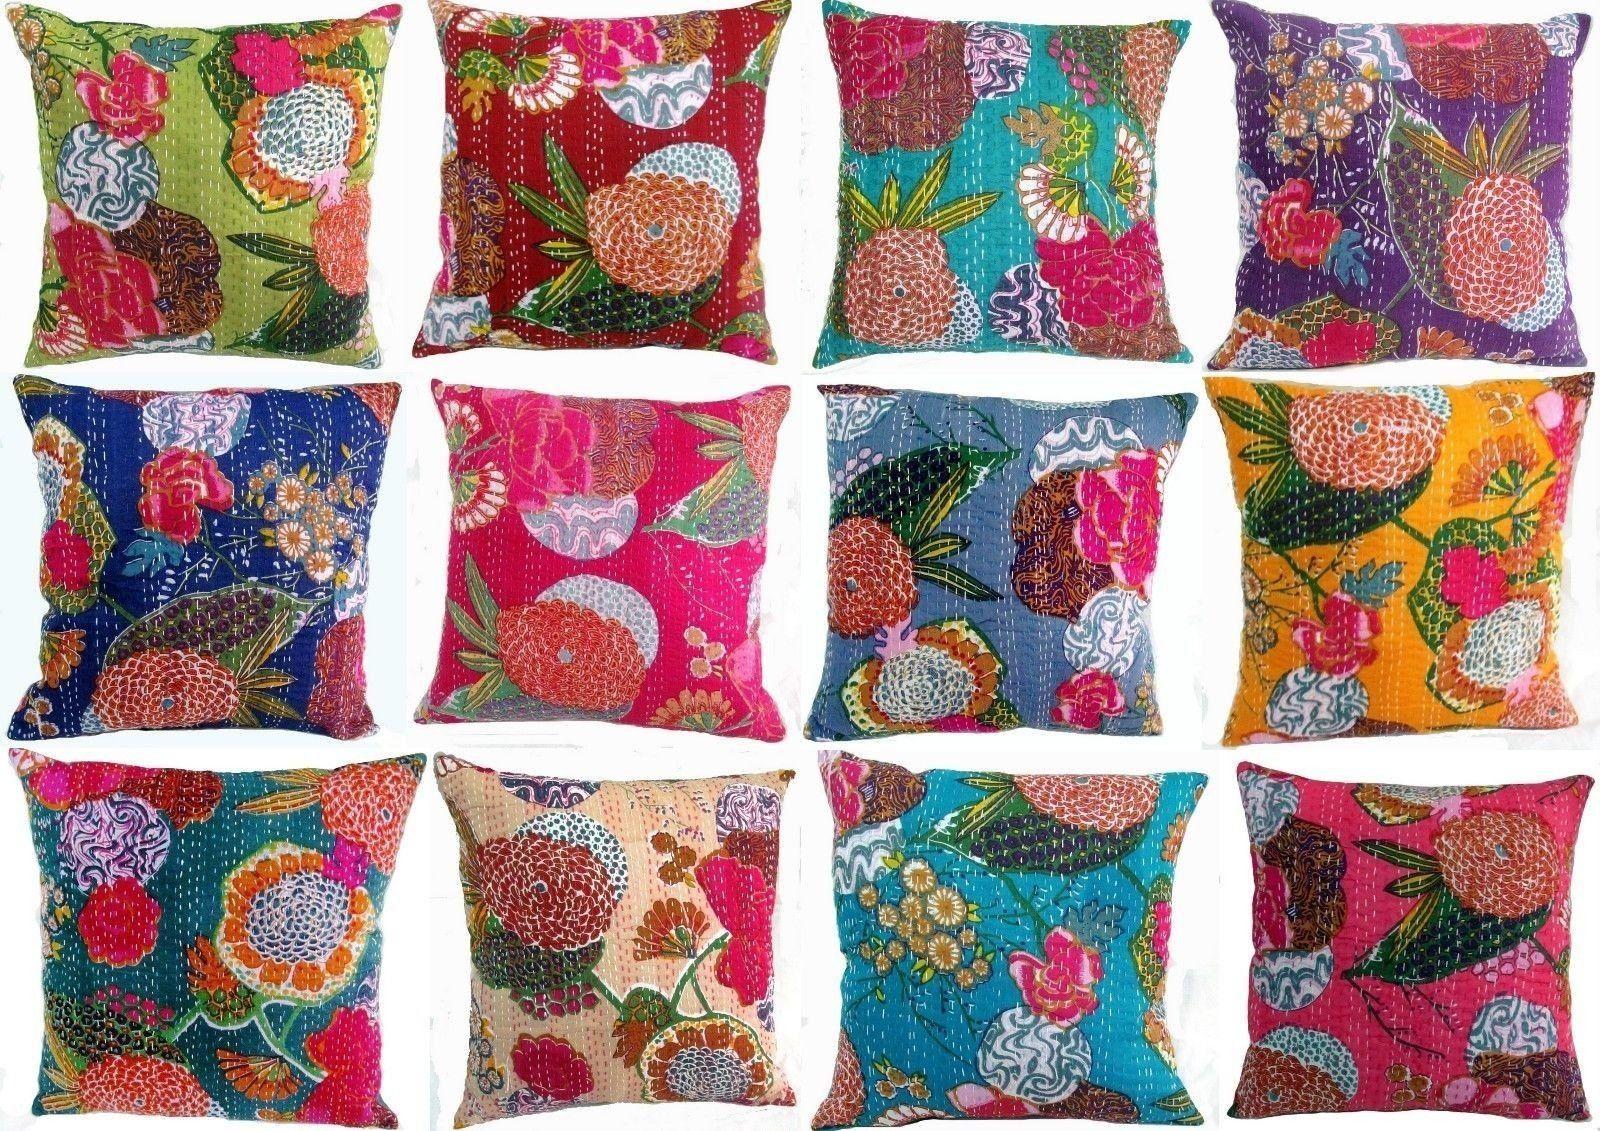 10 Pcs Hand Made Fruit Print Cotton Fabric Kantha Cushion Cover